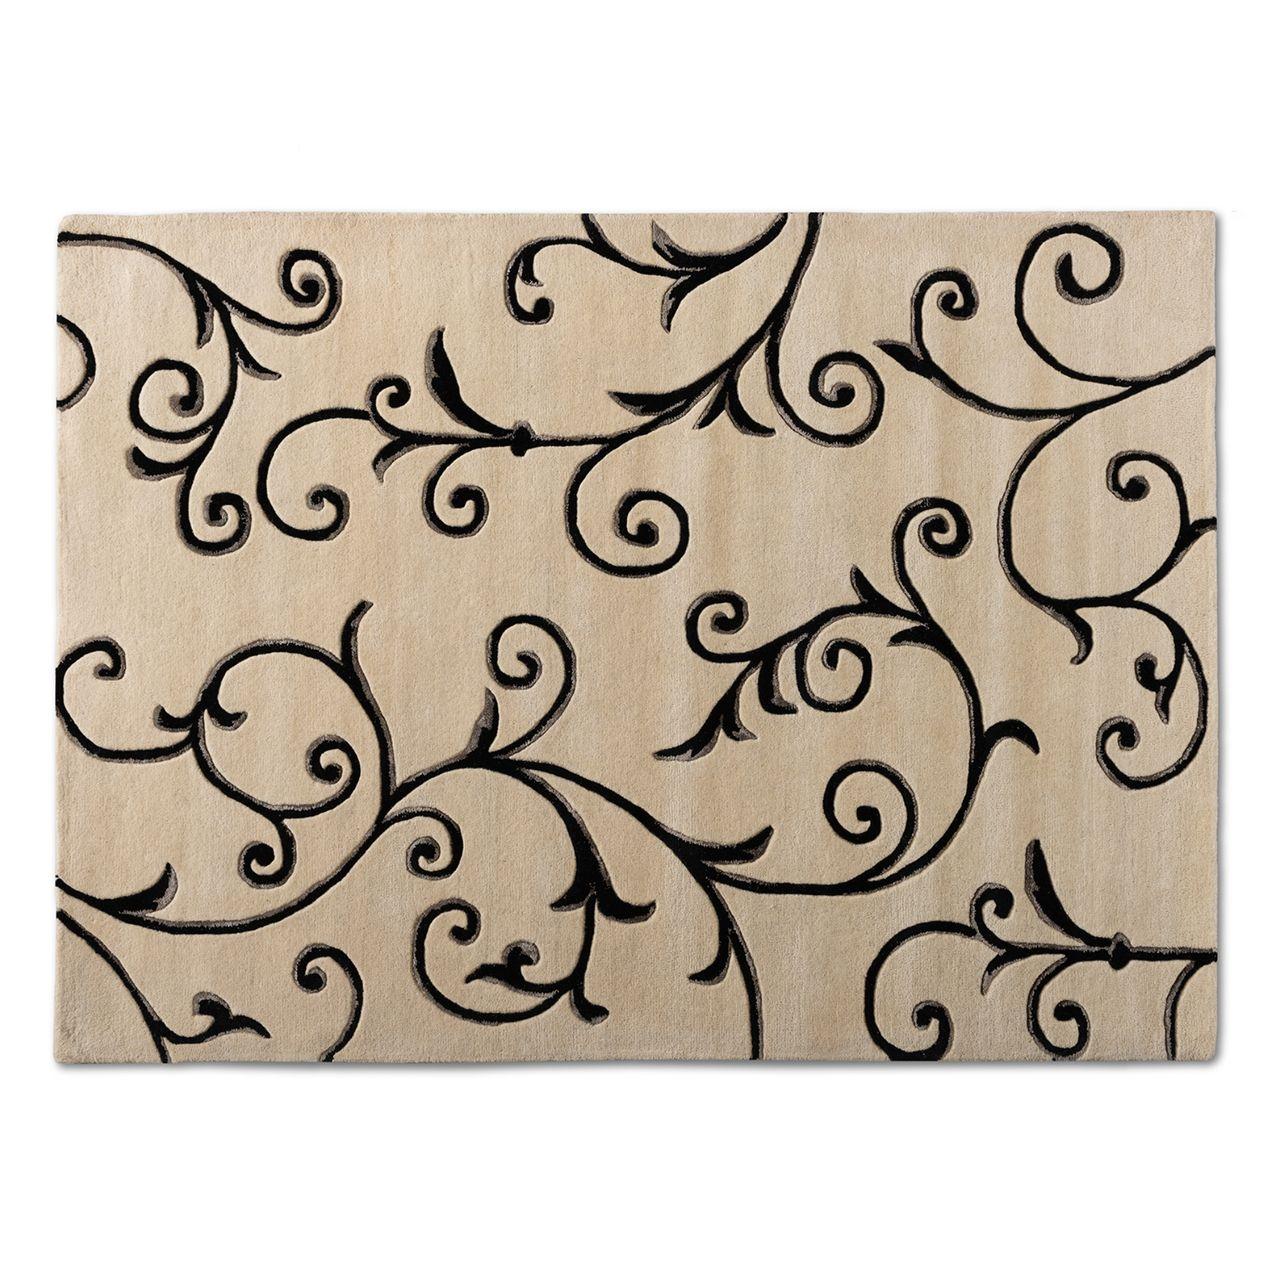 Baxton Studio Trellis Ivory and Black Hand-Tufted Wool Blend Area Rug